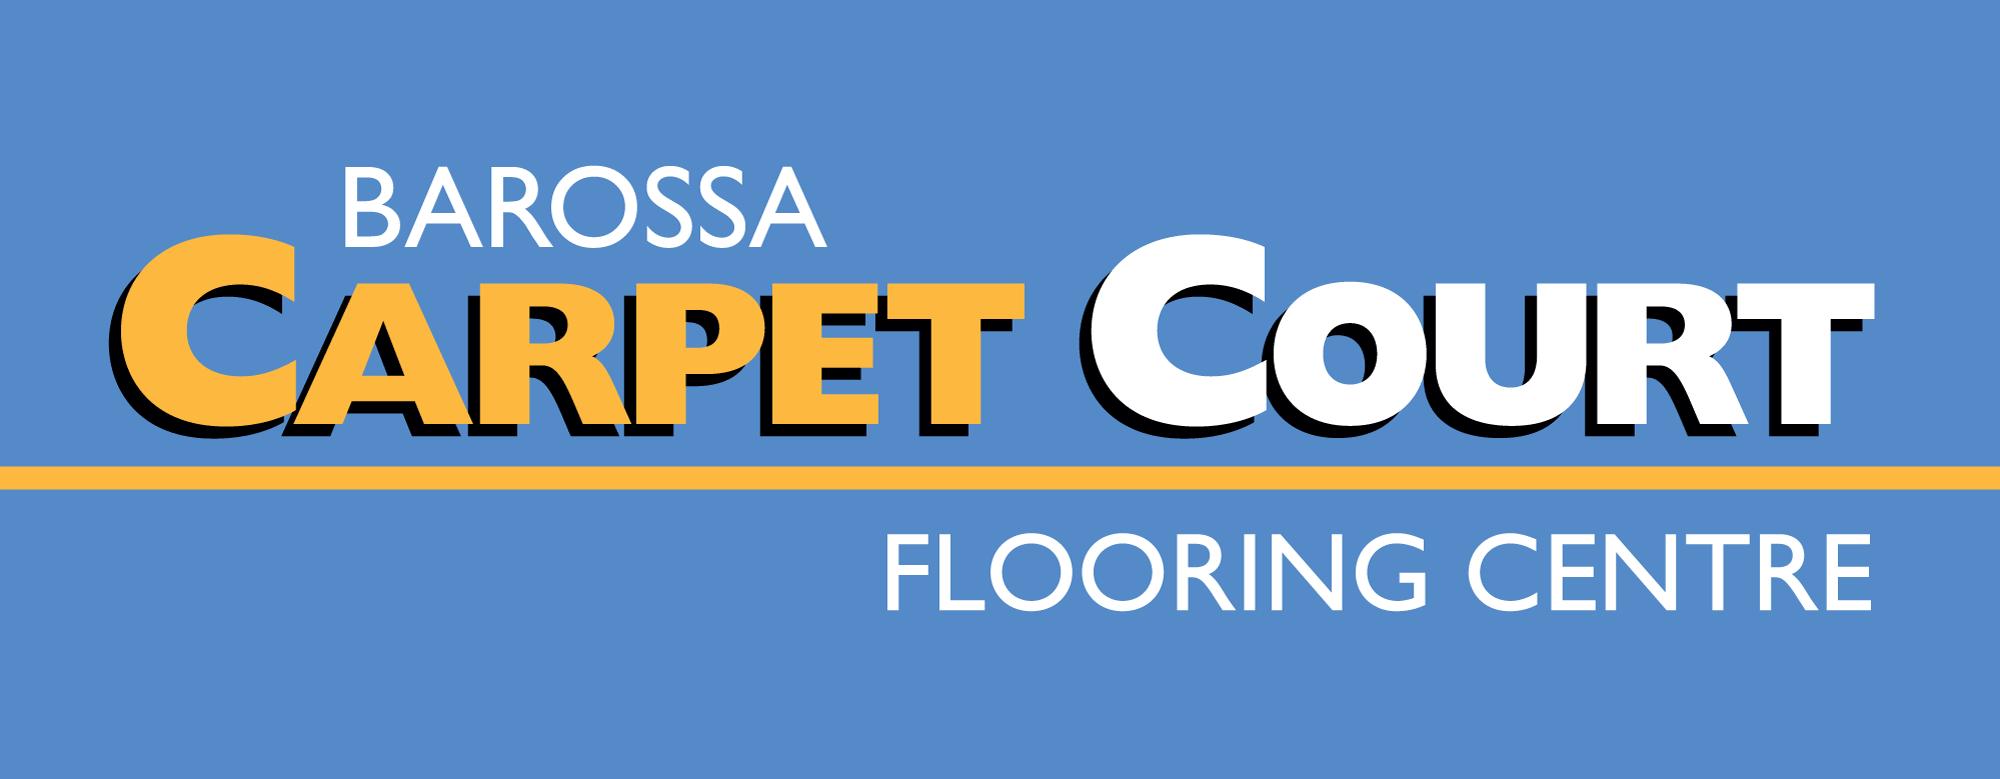 carpetcourt-logo